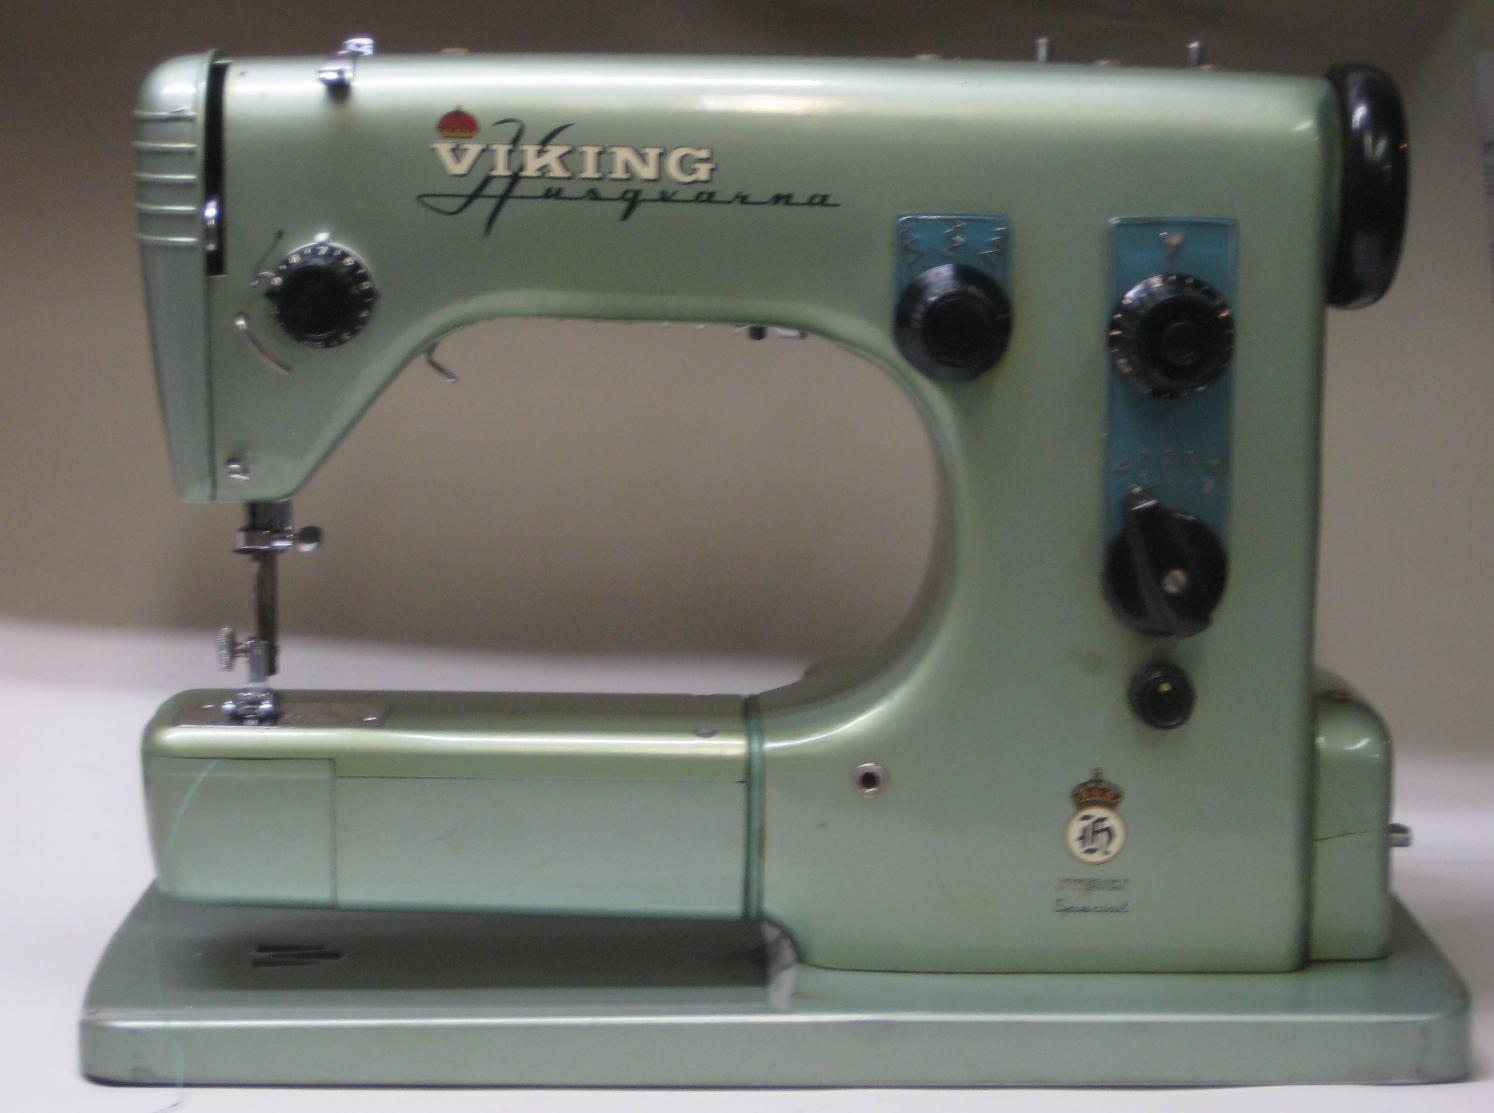 MI Vintage Sewing Machines: Husqvarna Viking SPECIAL (1950s)